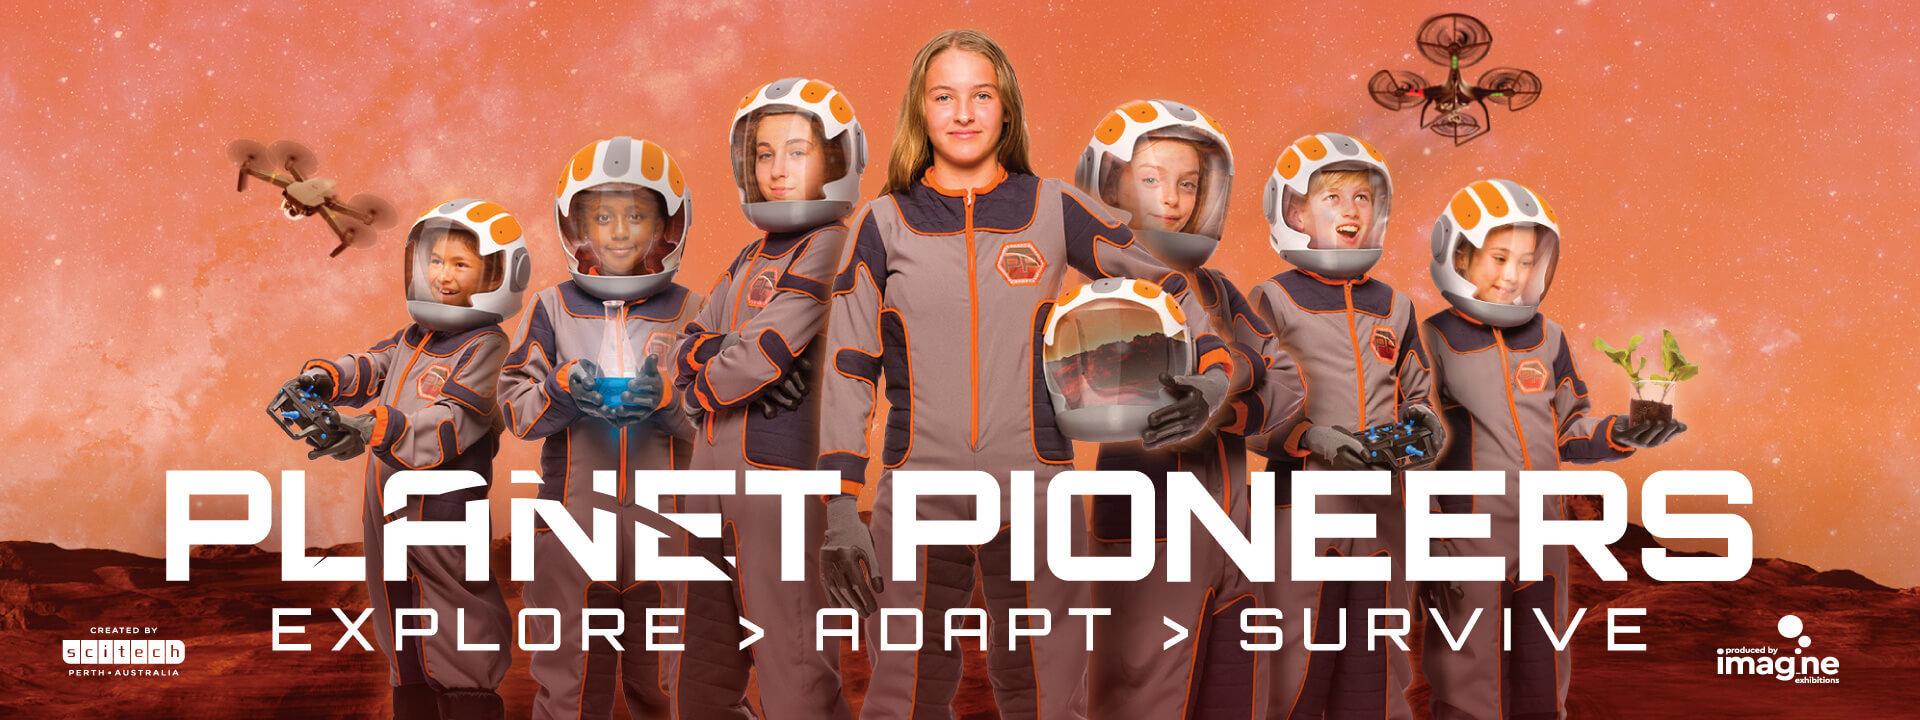 Planet Pioneers Exhibit - Explore > Adapt > Survive